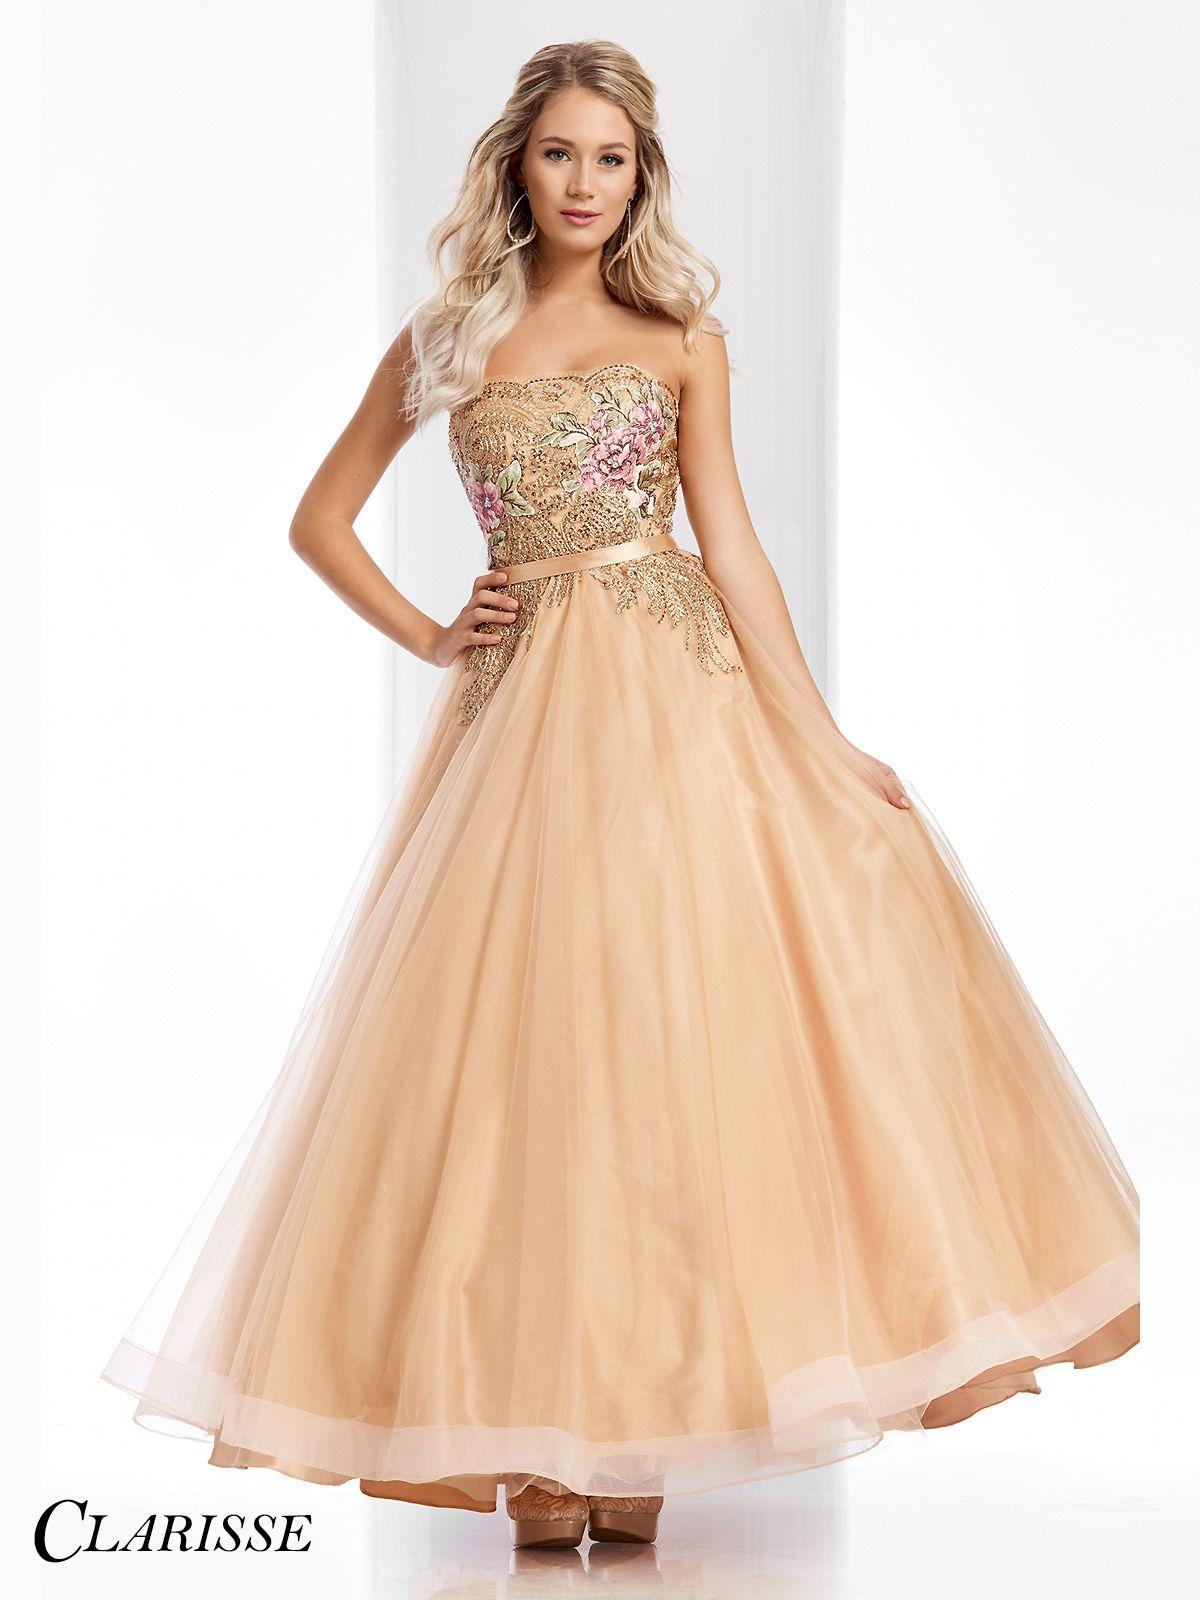 Clarisse Gold Floral Ball Gown 3010   Unique vintage, Ball gowns ...